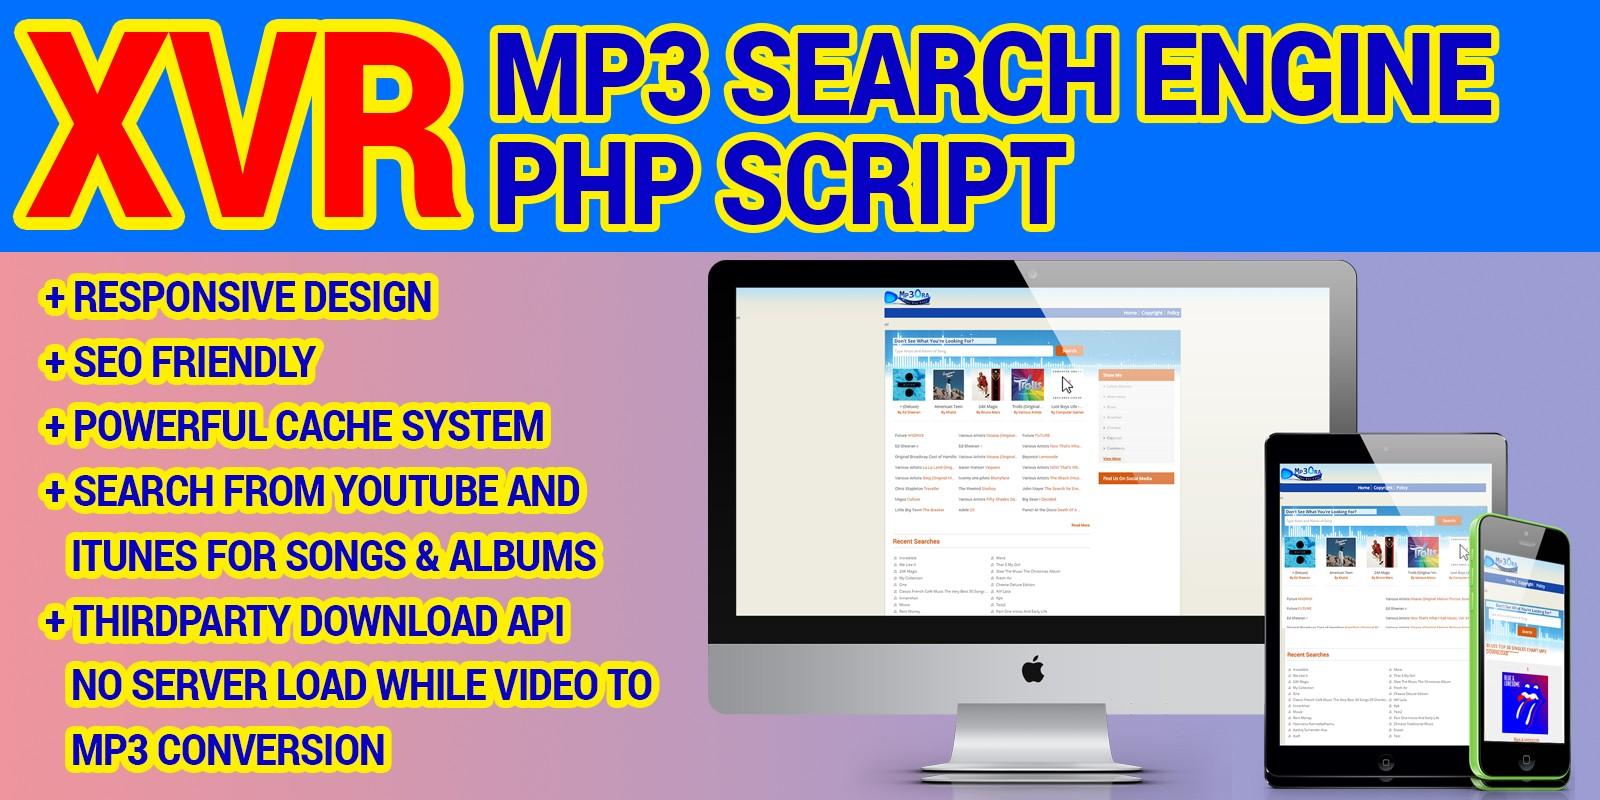 Mp3OraXVR - Mp3 Search Engine